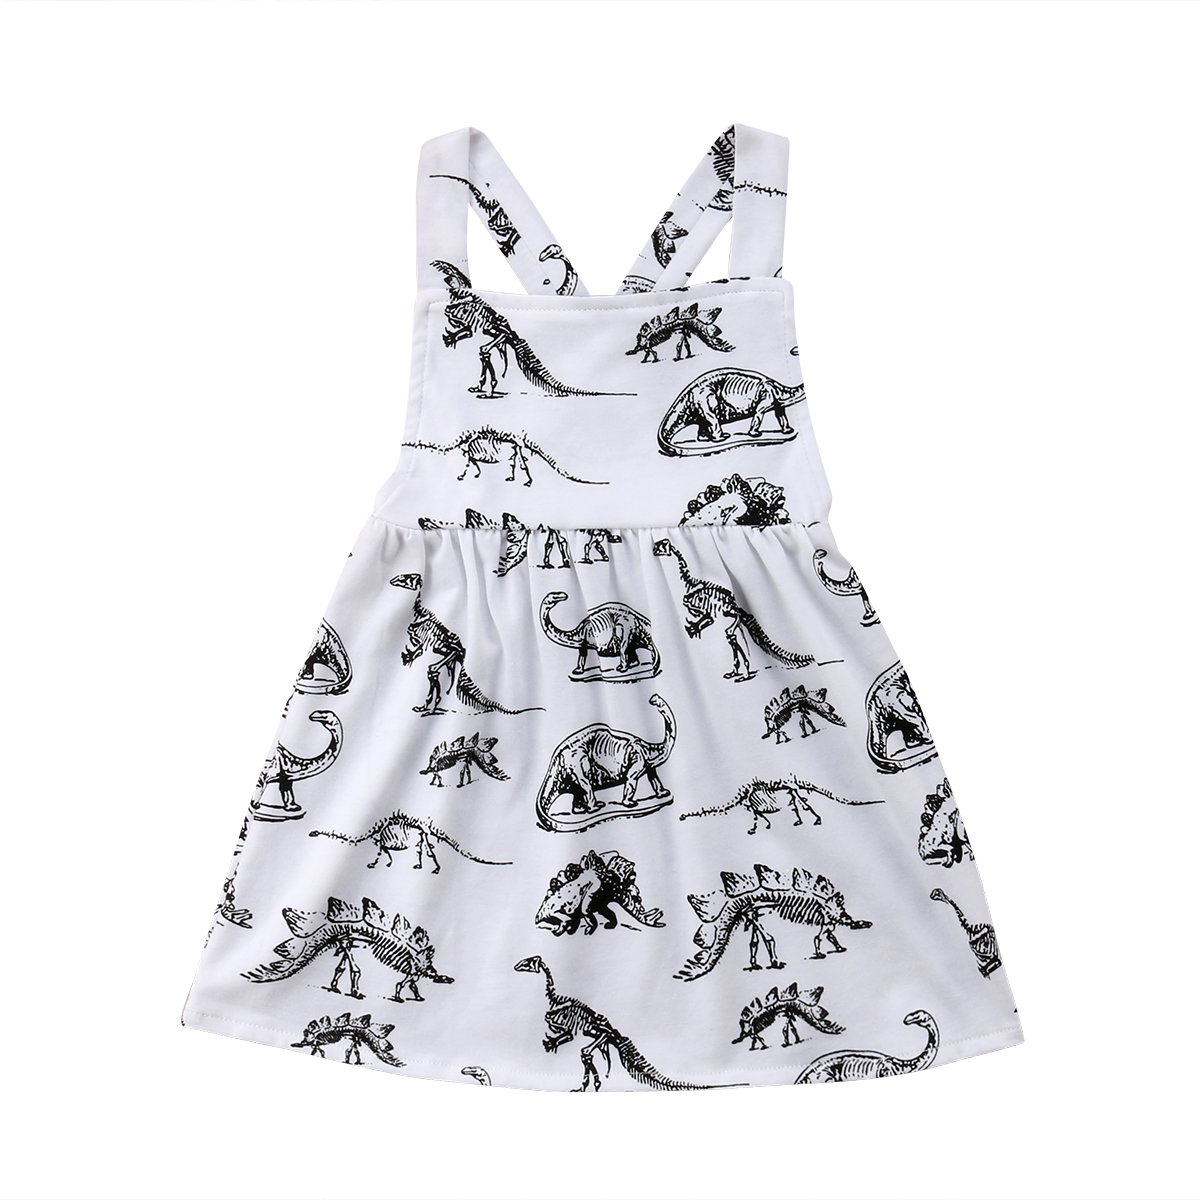 8ef73cf2a Amazon.com  yannzi Baby Girls Dinosaur Dress Clothes Ruffle Sleeve ...